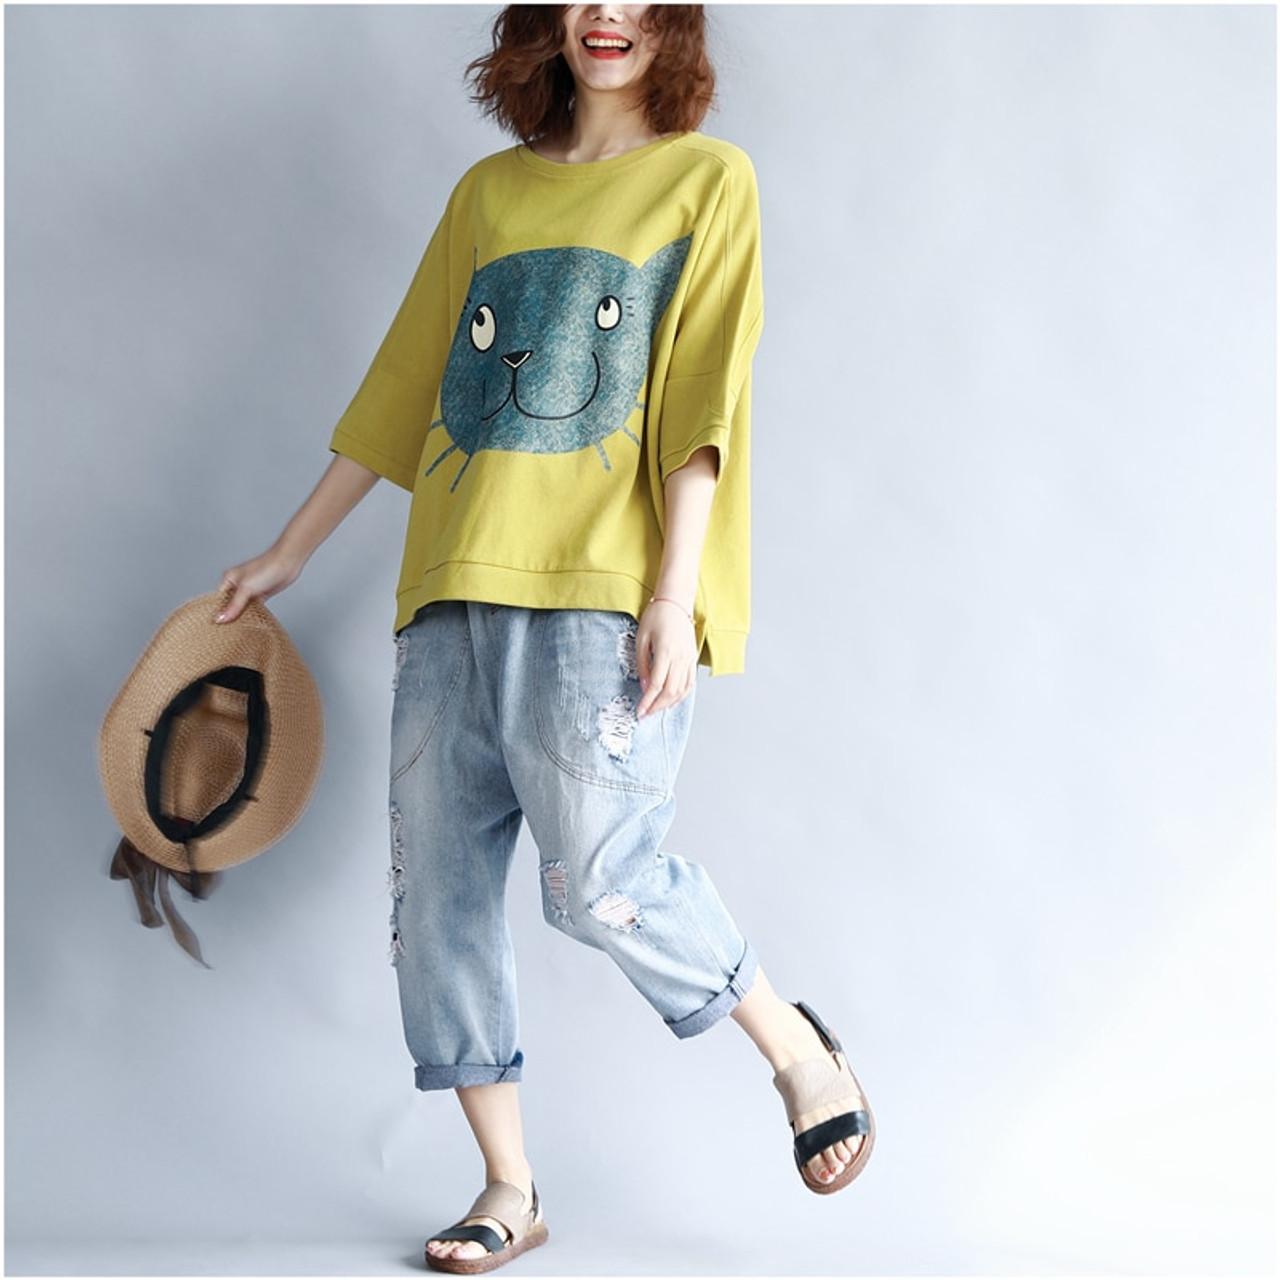 098b15f5d2 ... 2019 Summer Women Korean Cotton T Shirt Kawaii Cartoon Cat Print Tshirt  Women Plus Size Casual ...